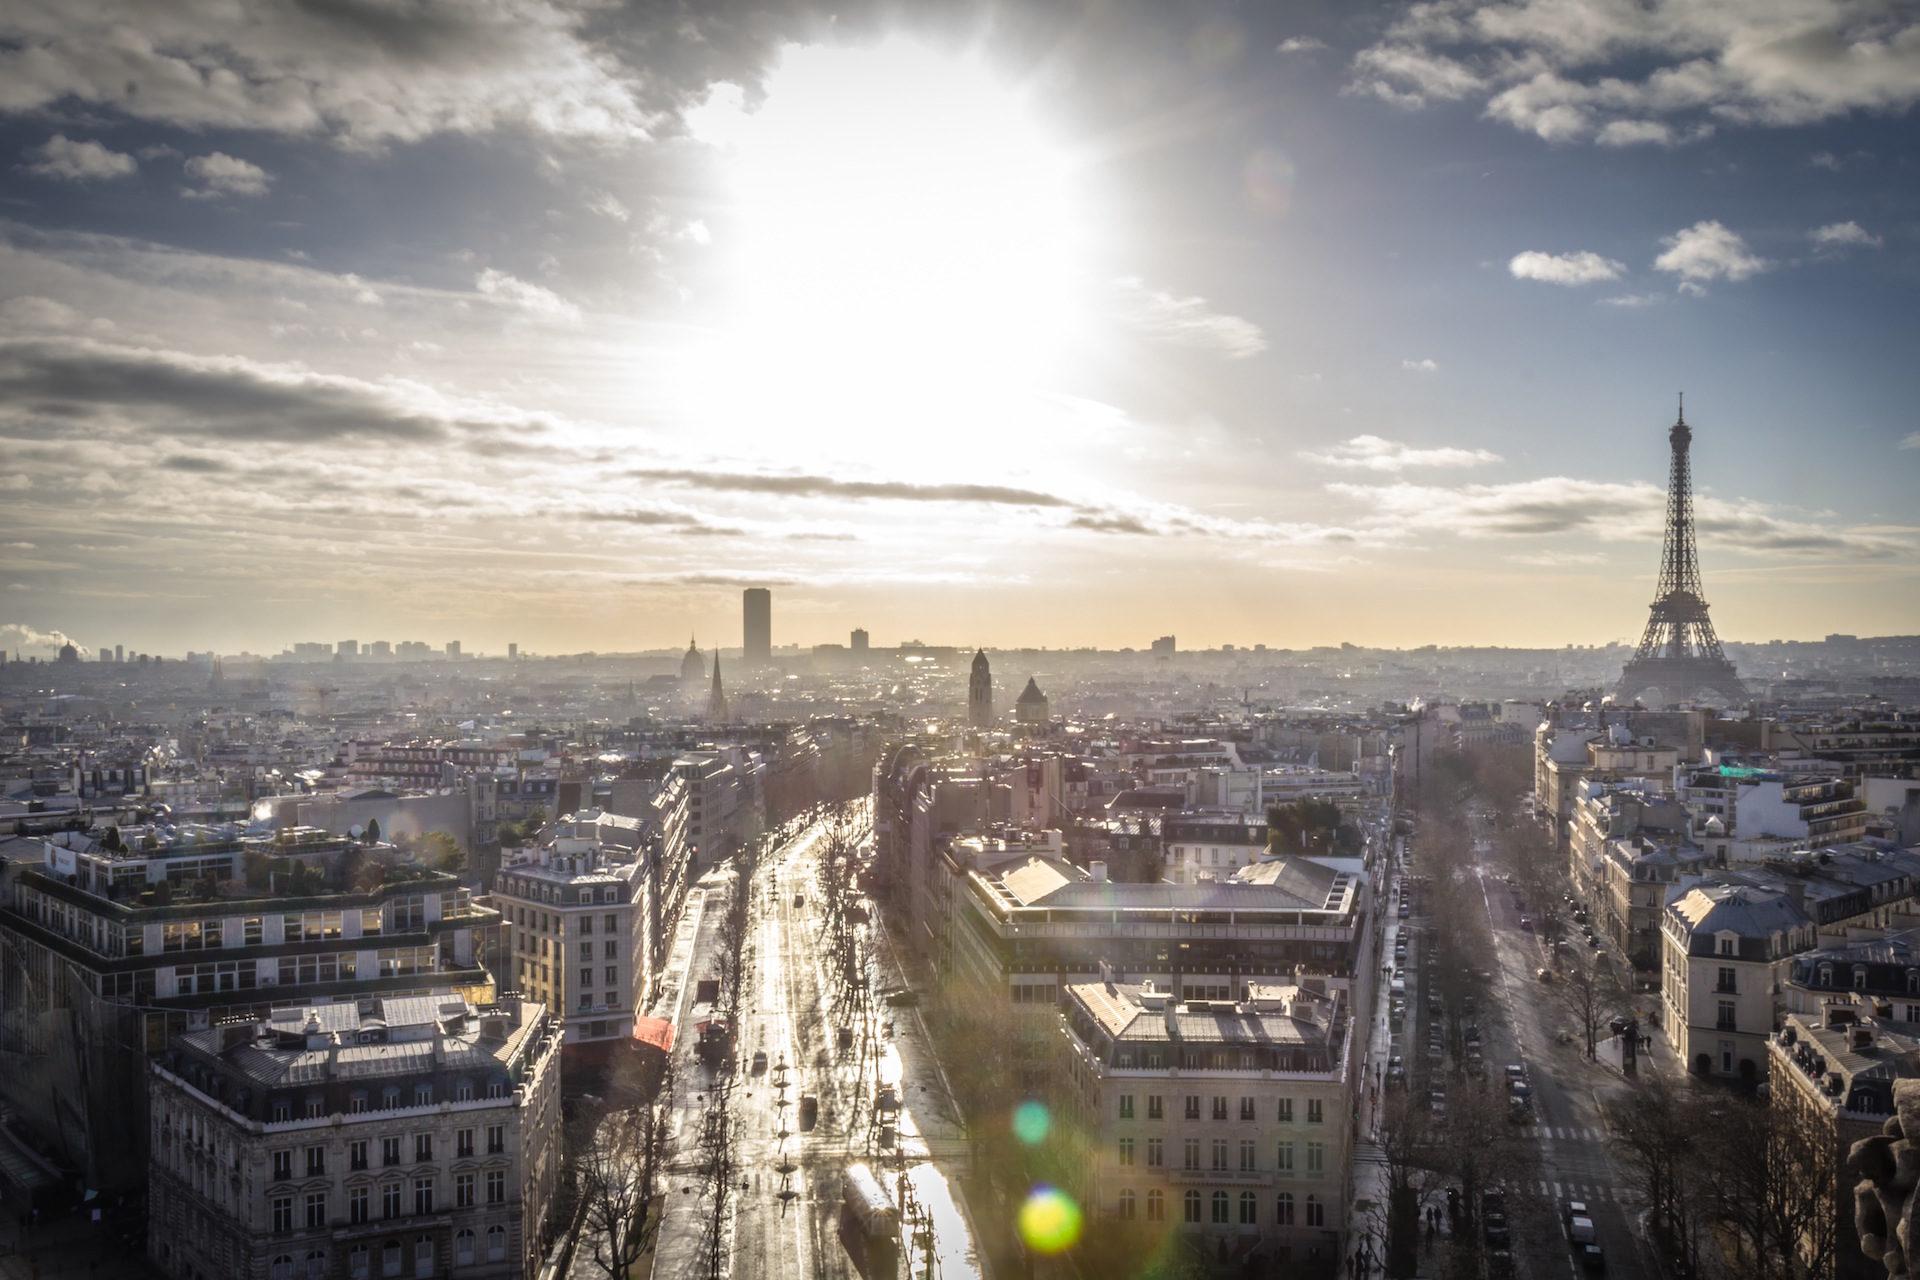 Париж, Франция, Башня, Eiffel, Солнце - Обои HD - Профессор falken.com